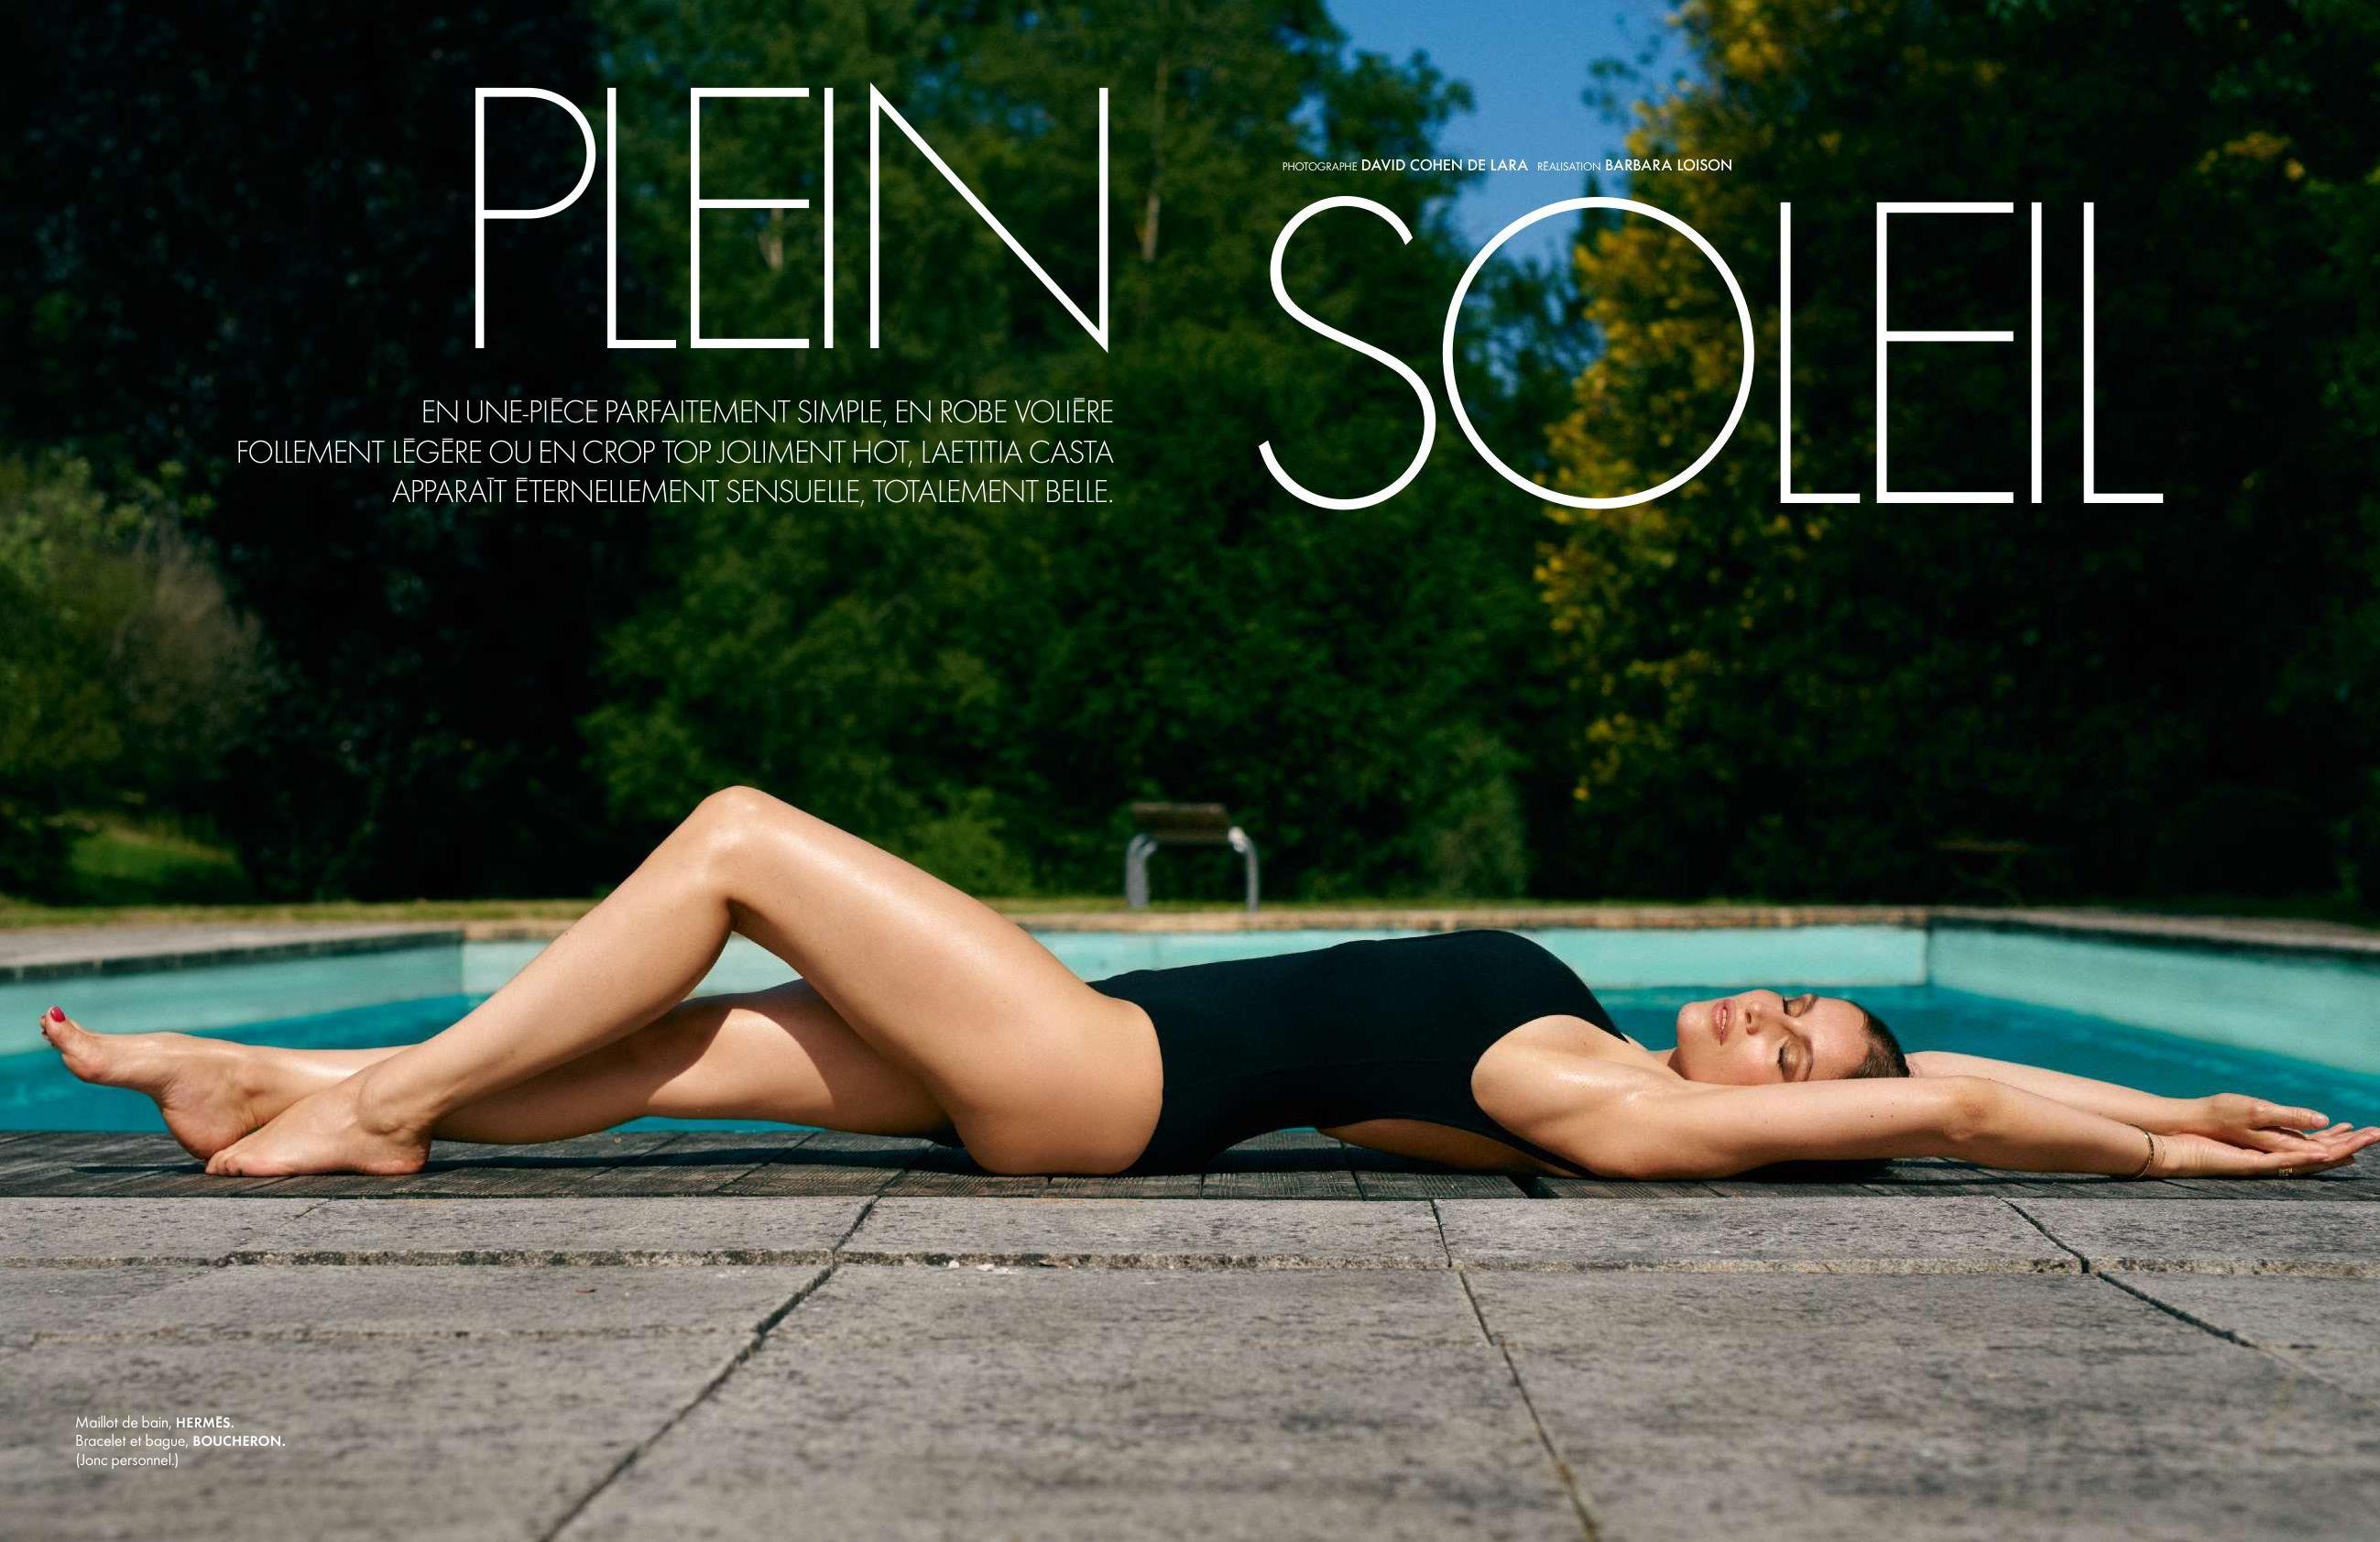 Hacked Richelle Taylor nudes (75 photos), Sexy, Hot, Feet, legs 2020